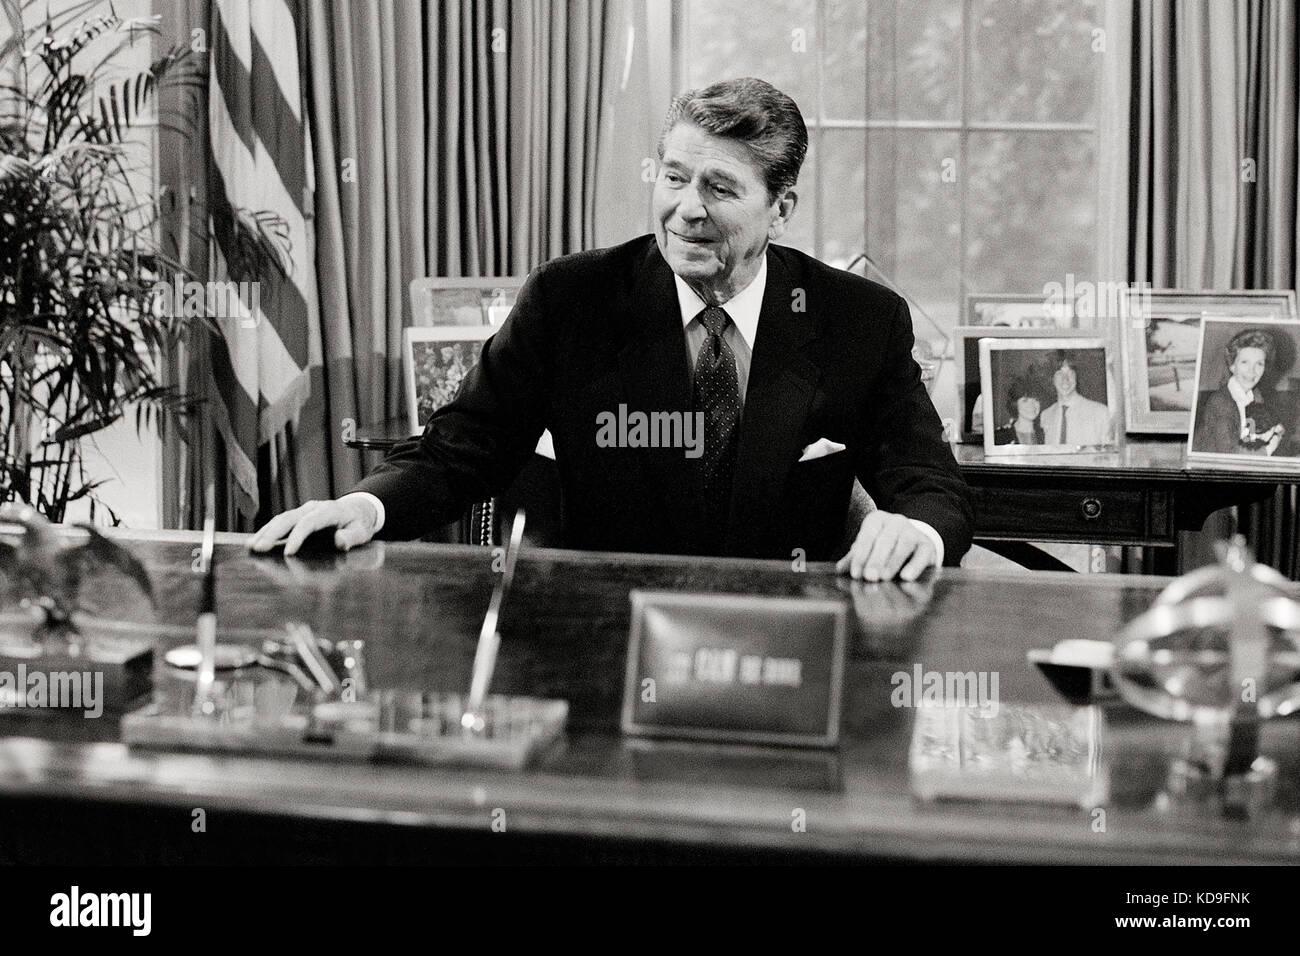 President Ronald Reagan Football PHOTO Oval Office White House